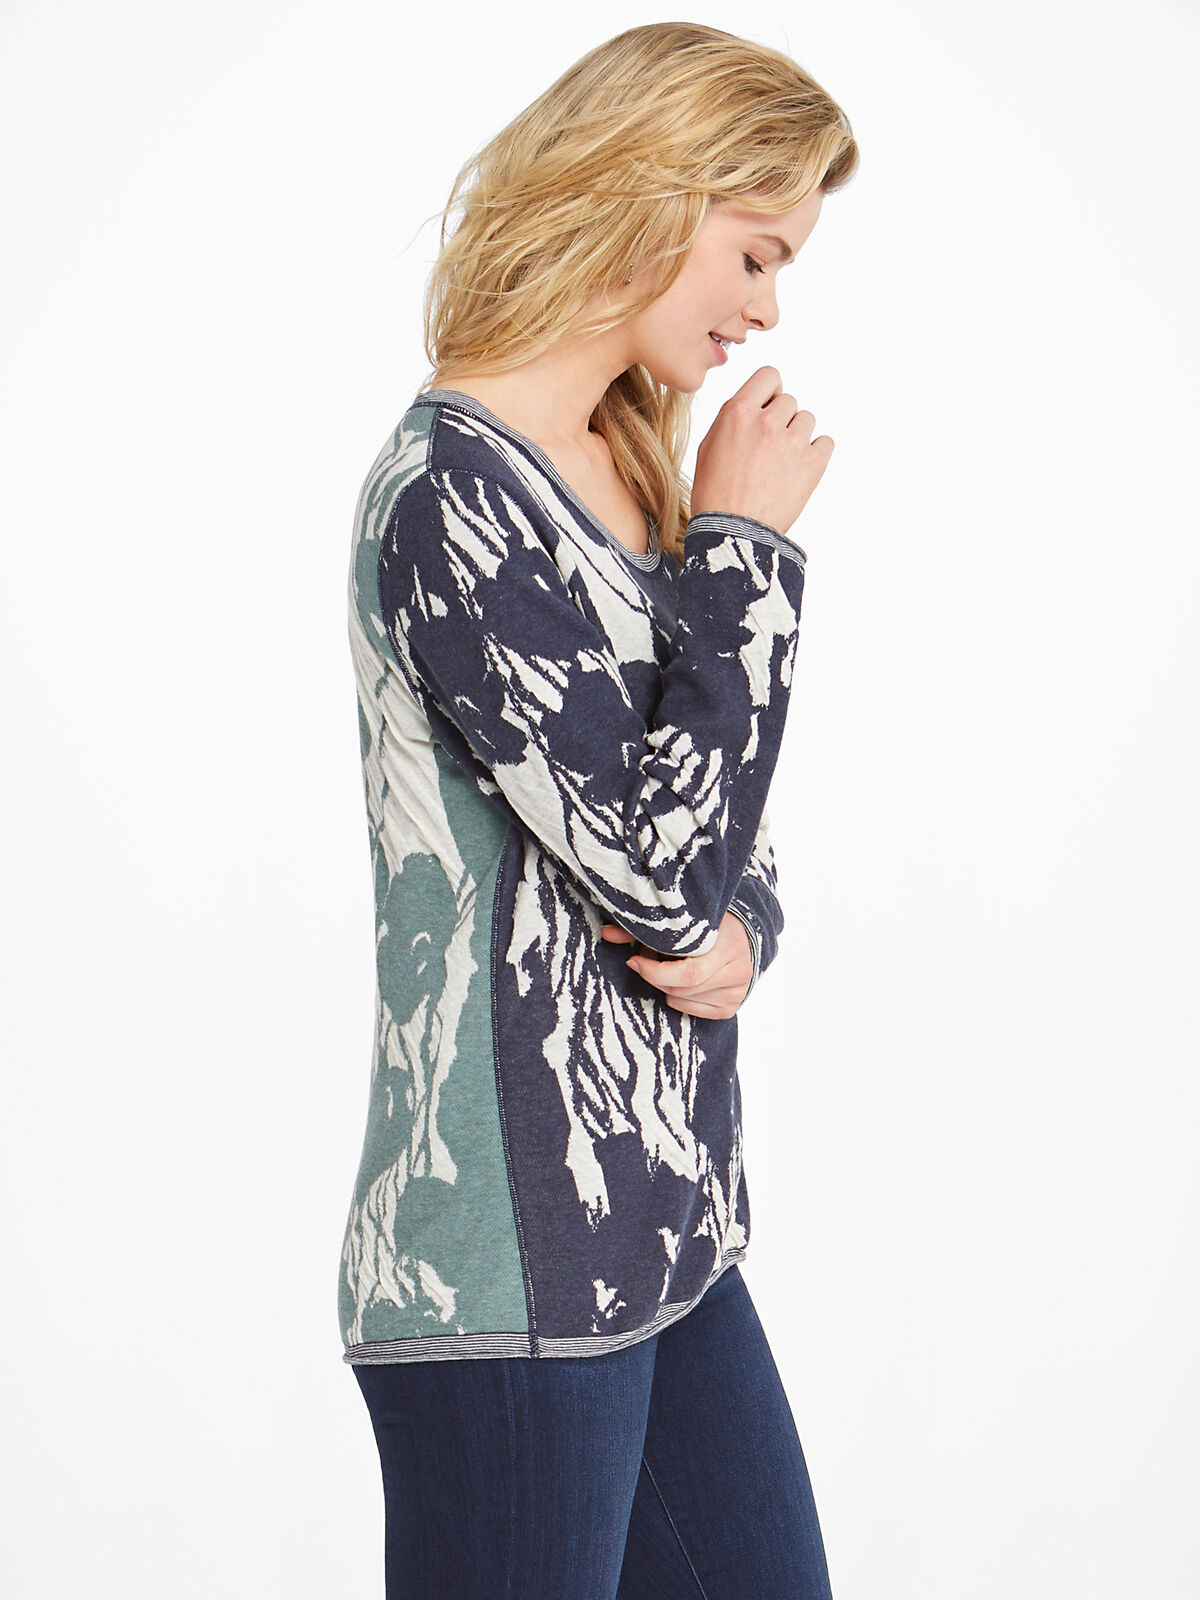 Wildflower Sweater